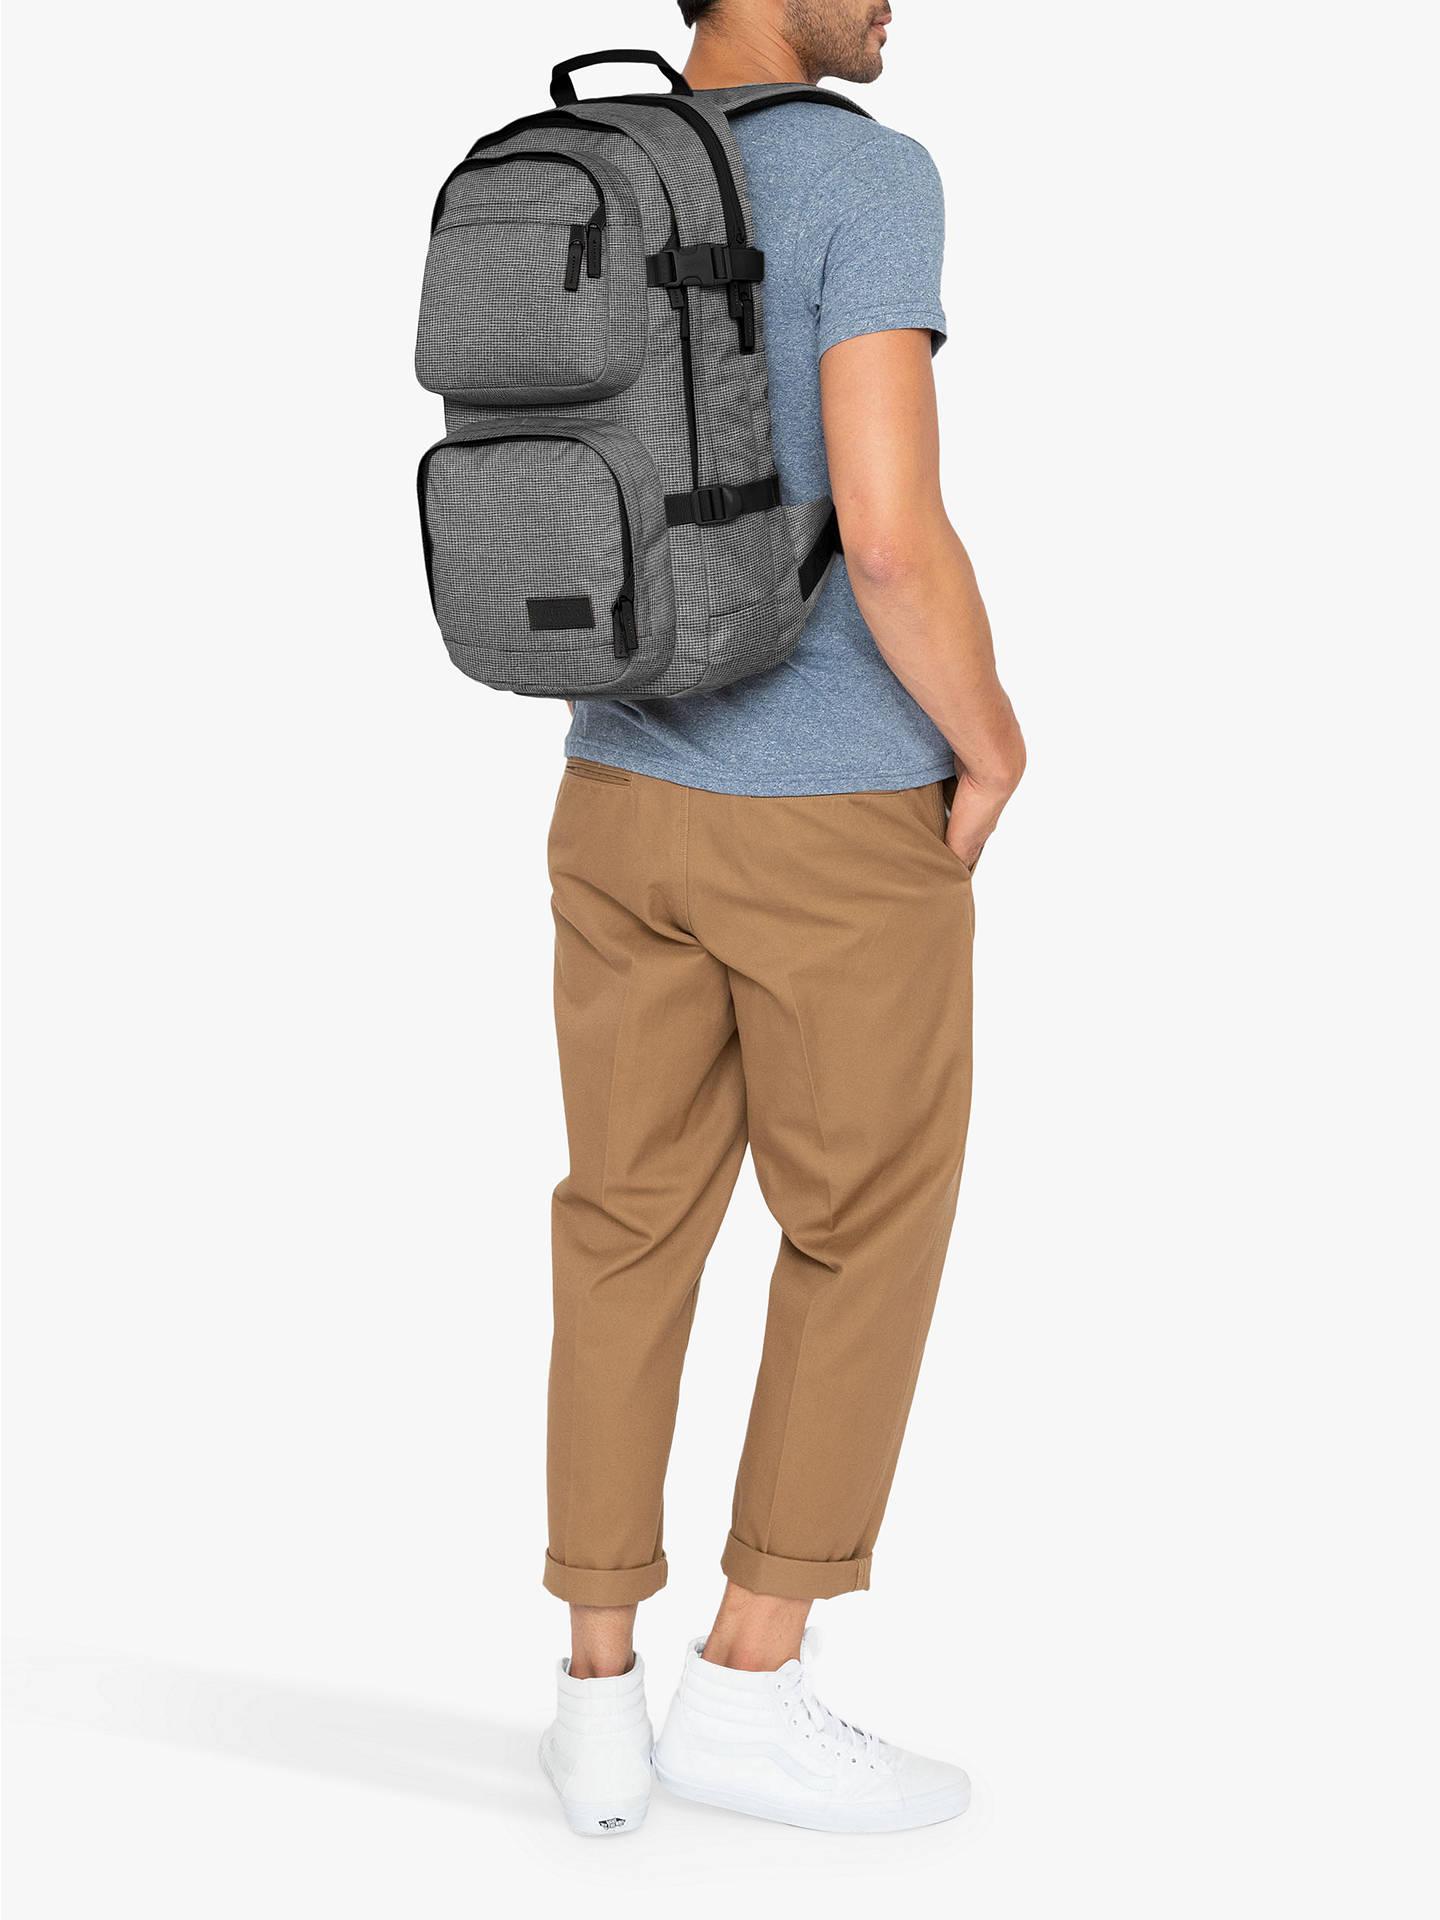 verschillende ontwerpen koop goed 100% echt Eastpak Hutson Backpack, Ash Blend at John Lewis & Partners